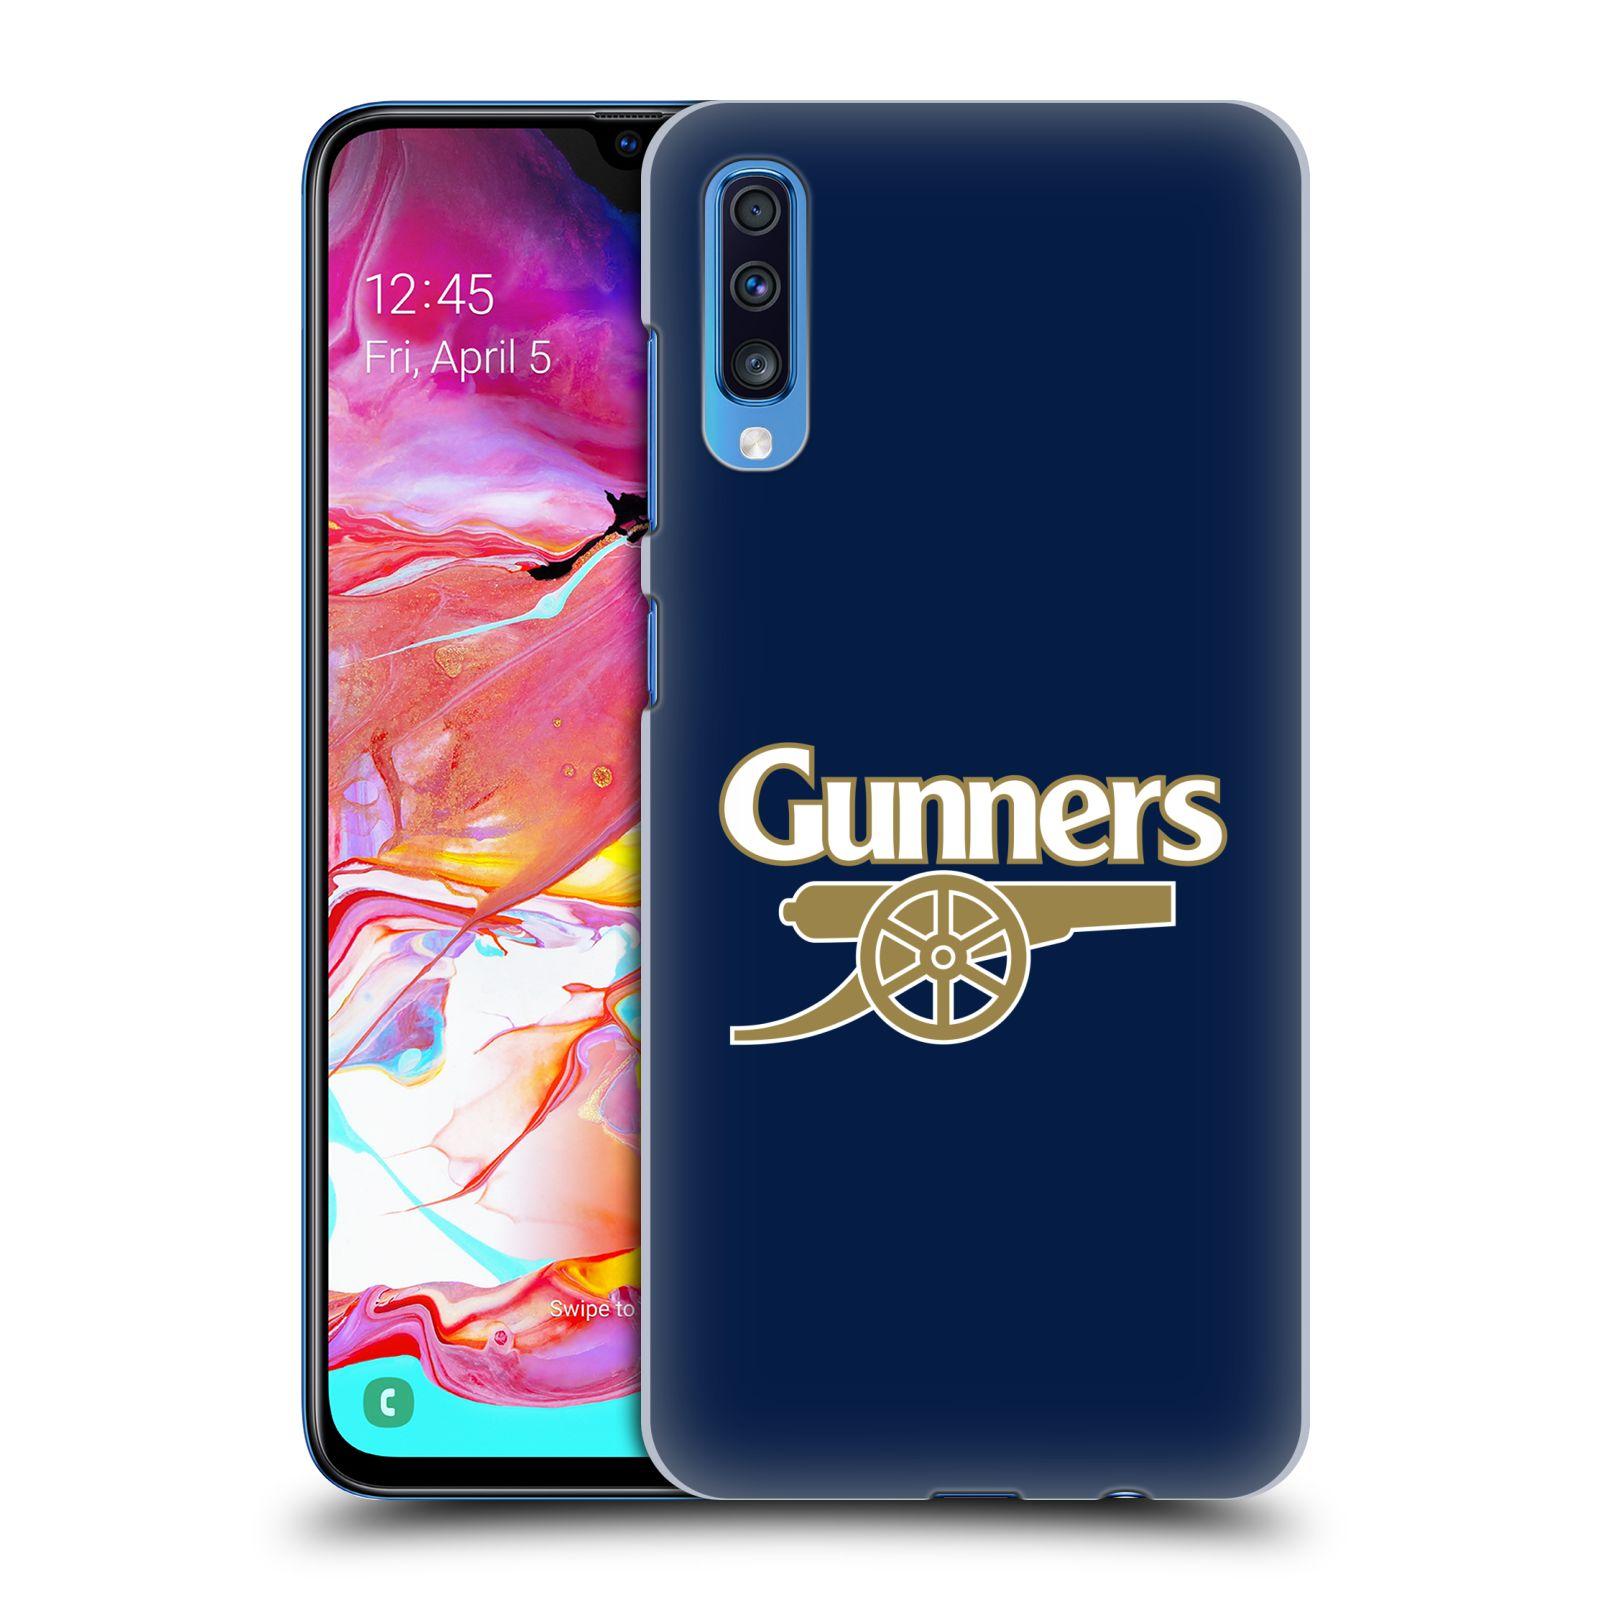 Plastové pouzdro na mobil Samsung Galaxy A70 - Head Case - Arsenal FC - Gunners